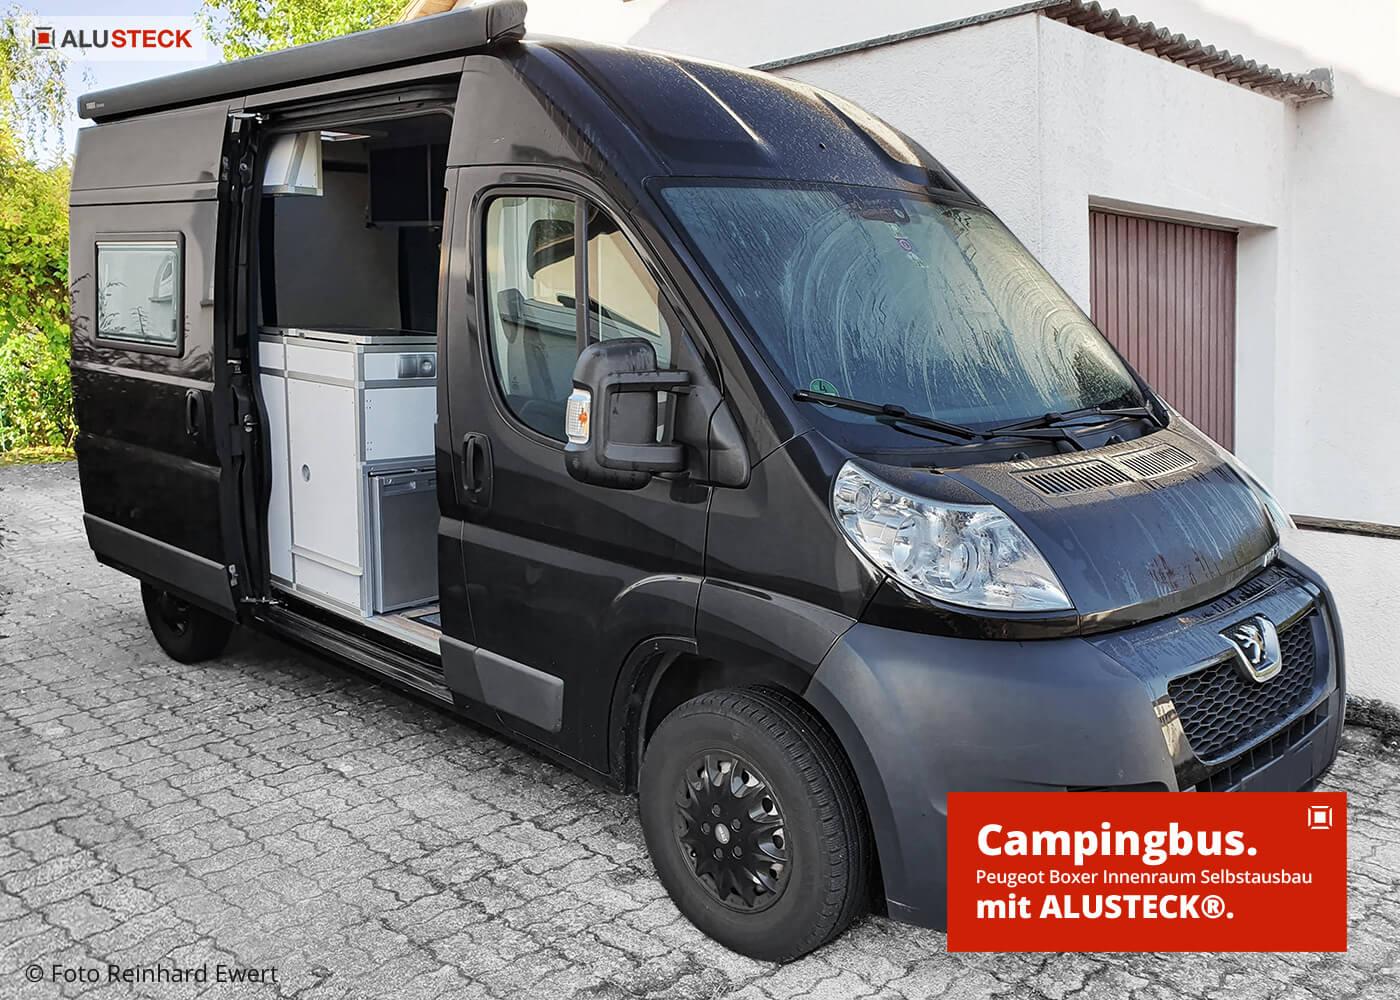 Wohnmobil Camper Peugeot Boxer Ausbau - Innenausbau mit ALUSTECK®